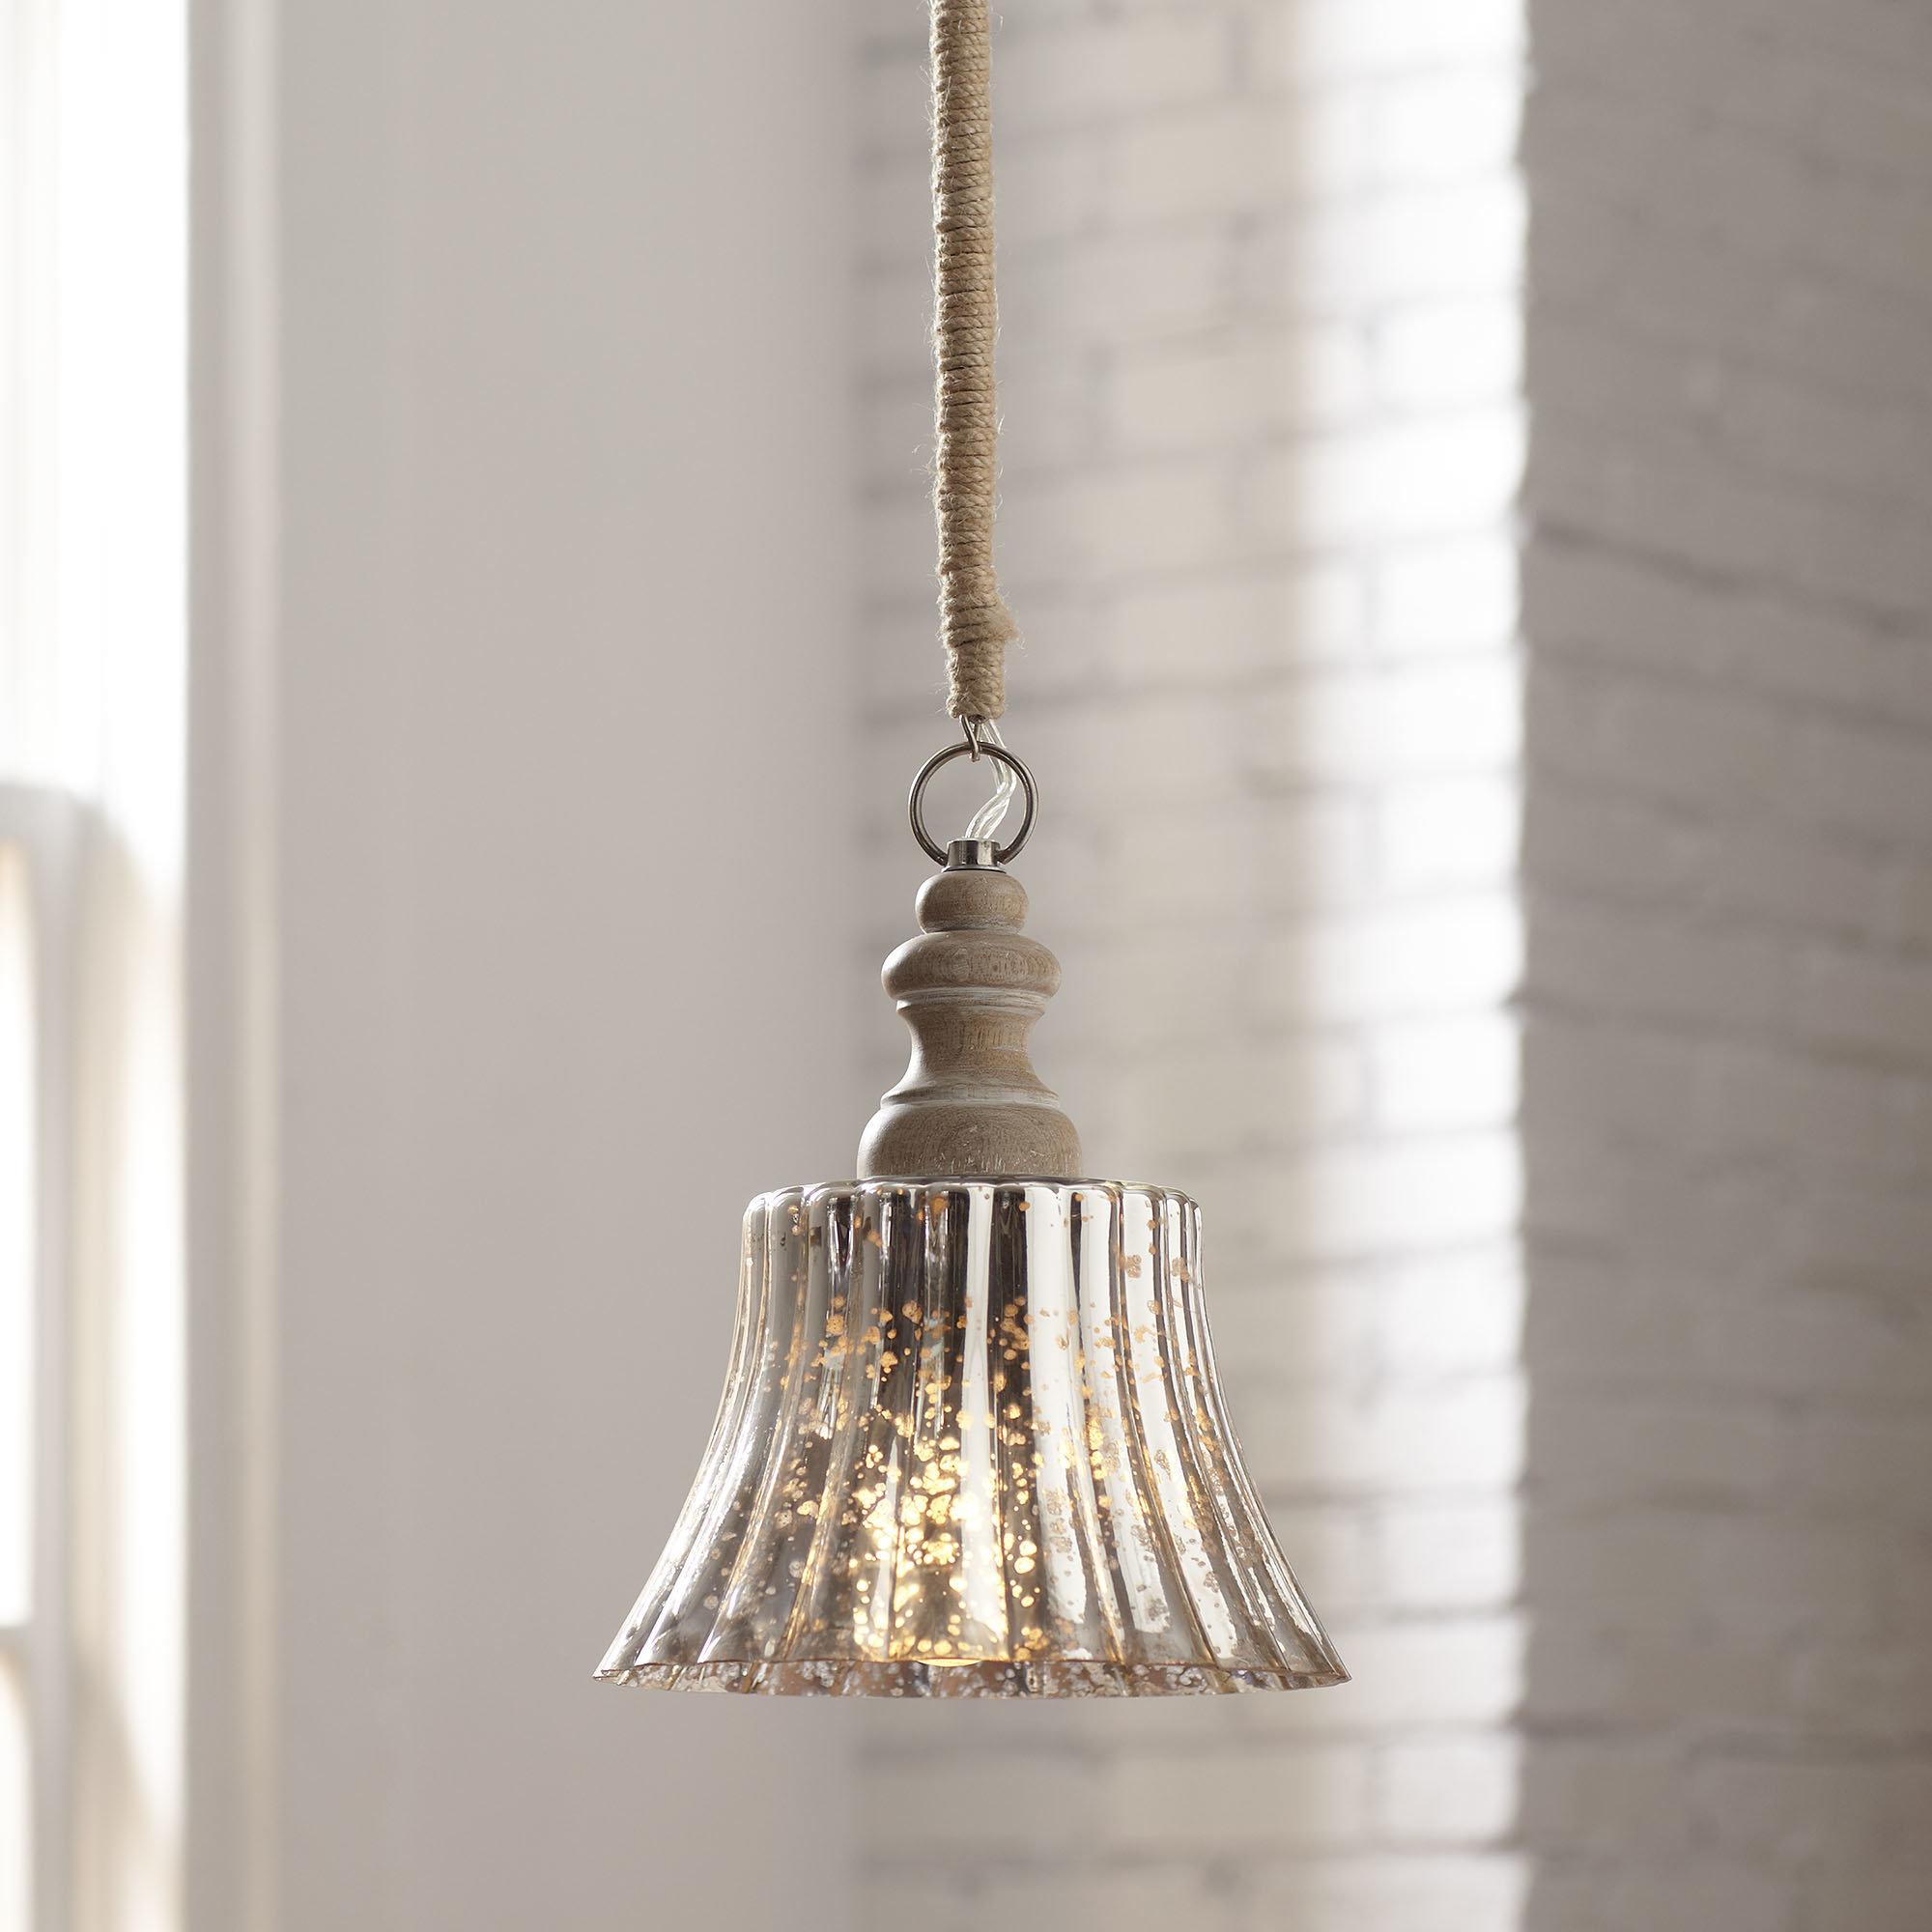 Klas 1 Light Bell Pendant Throughout Akakios 1 Light Single Bell Pendants (Image 15 of 30)